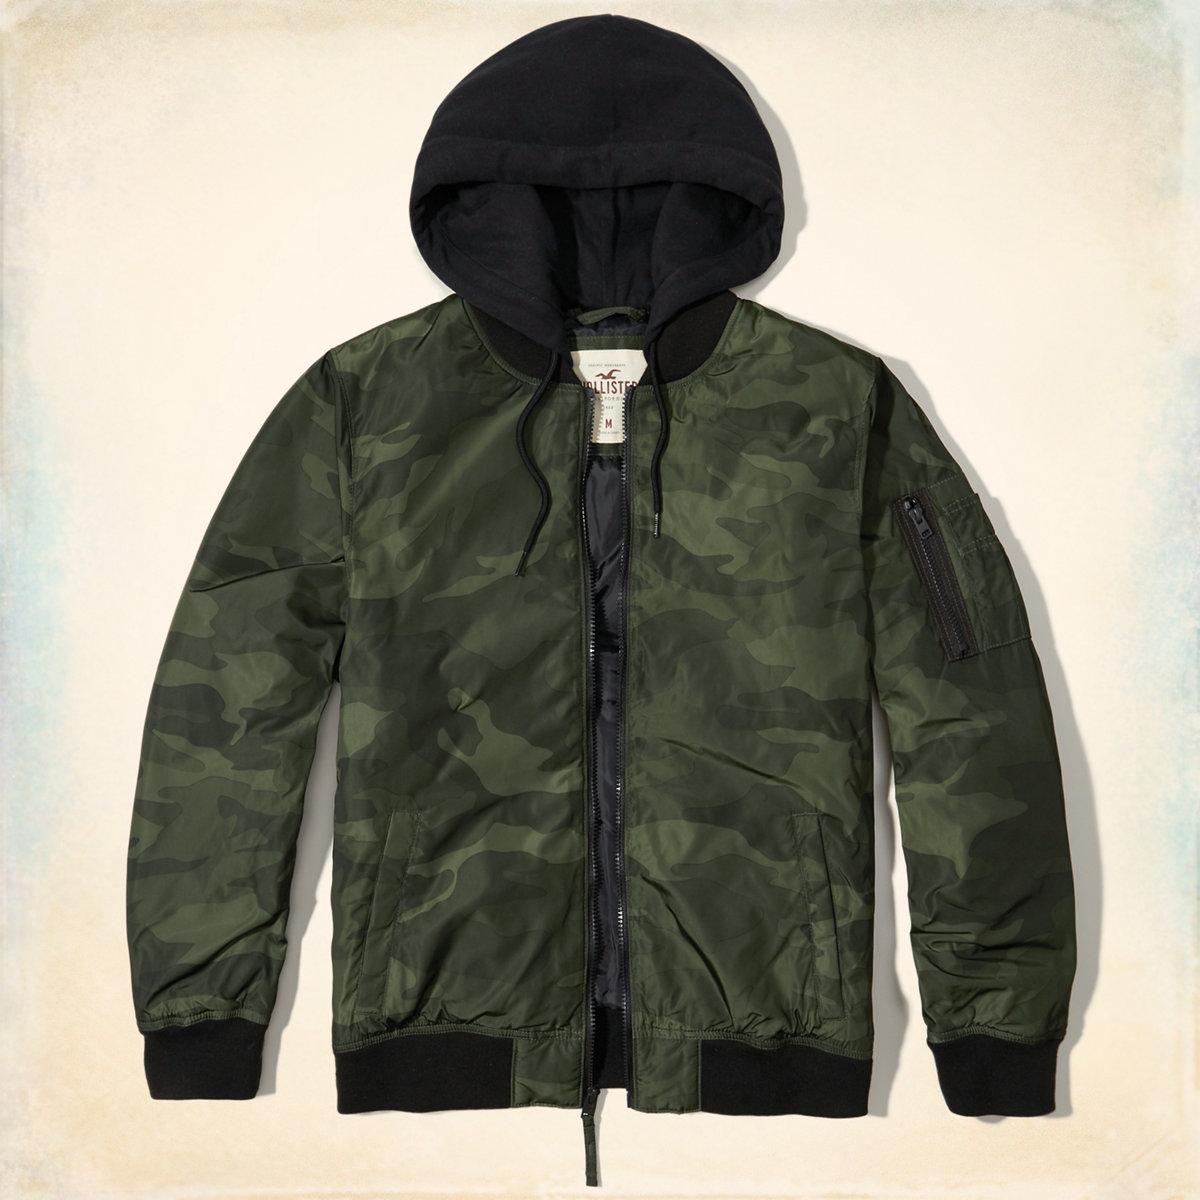 Camo Hooded Bomber Jacket